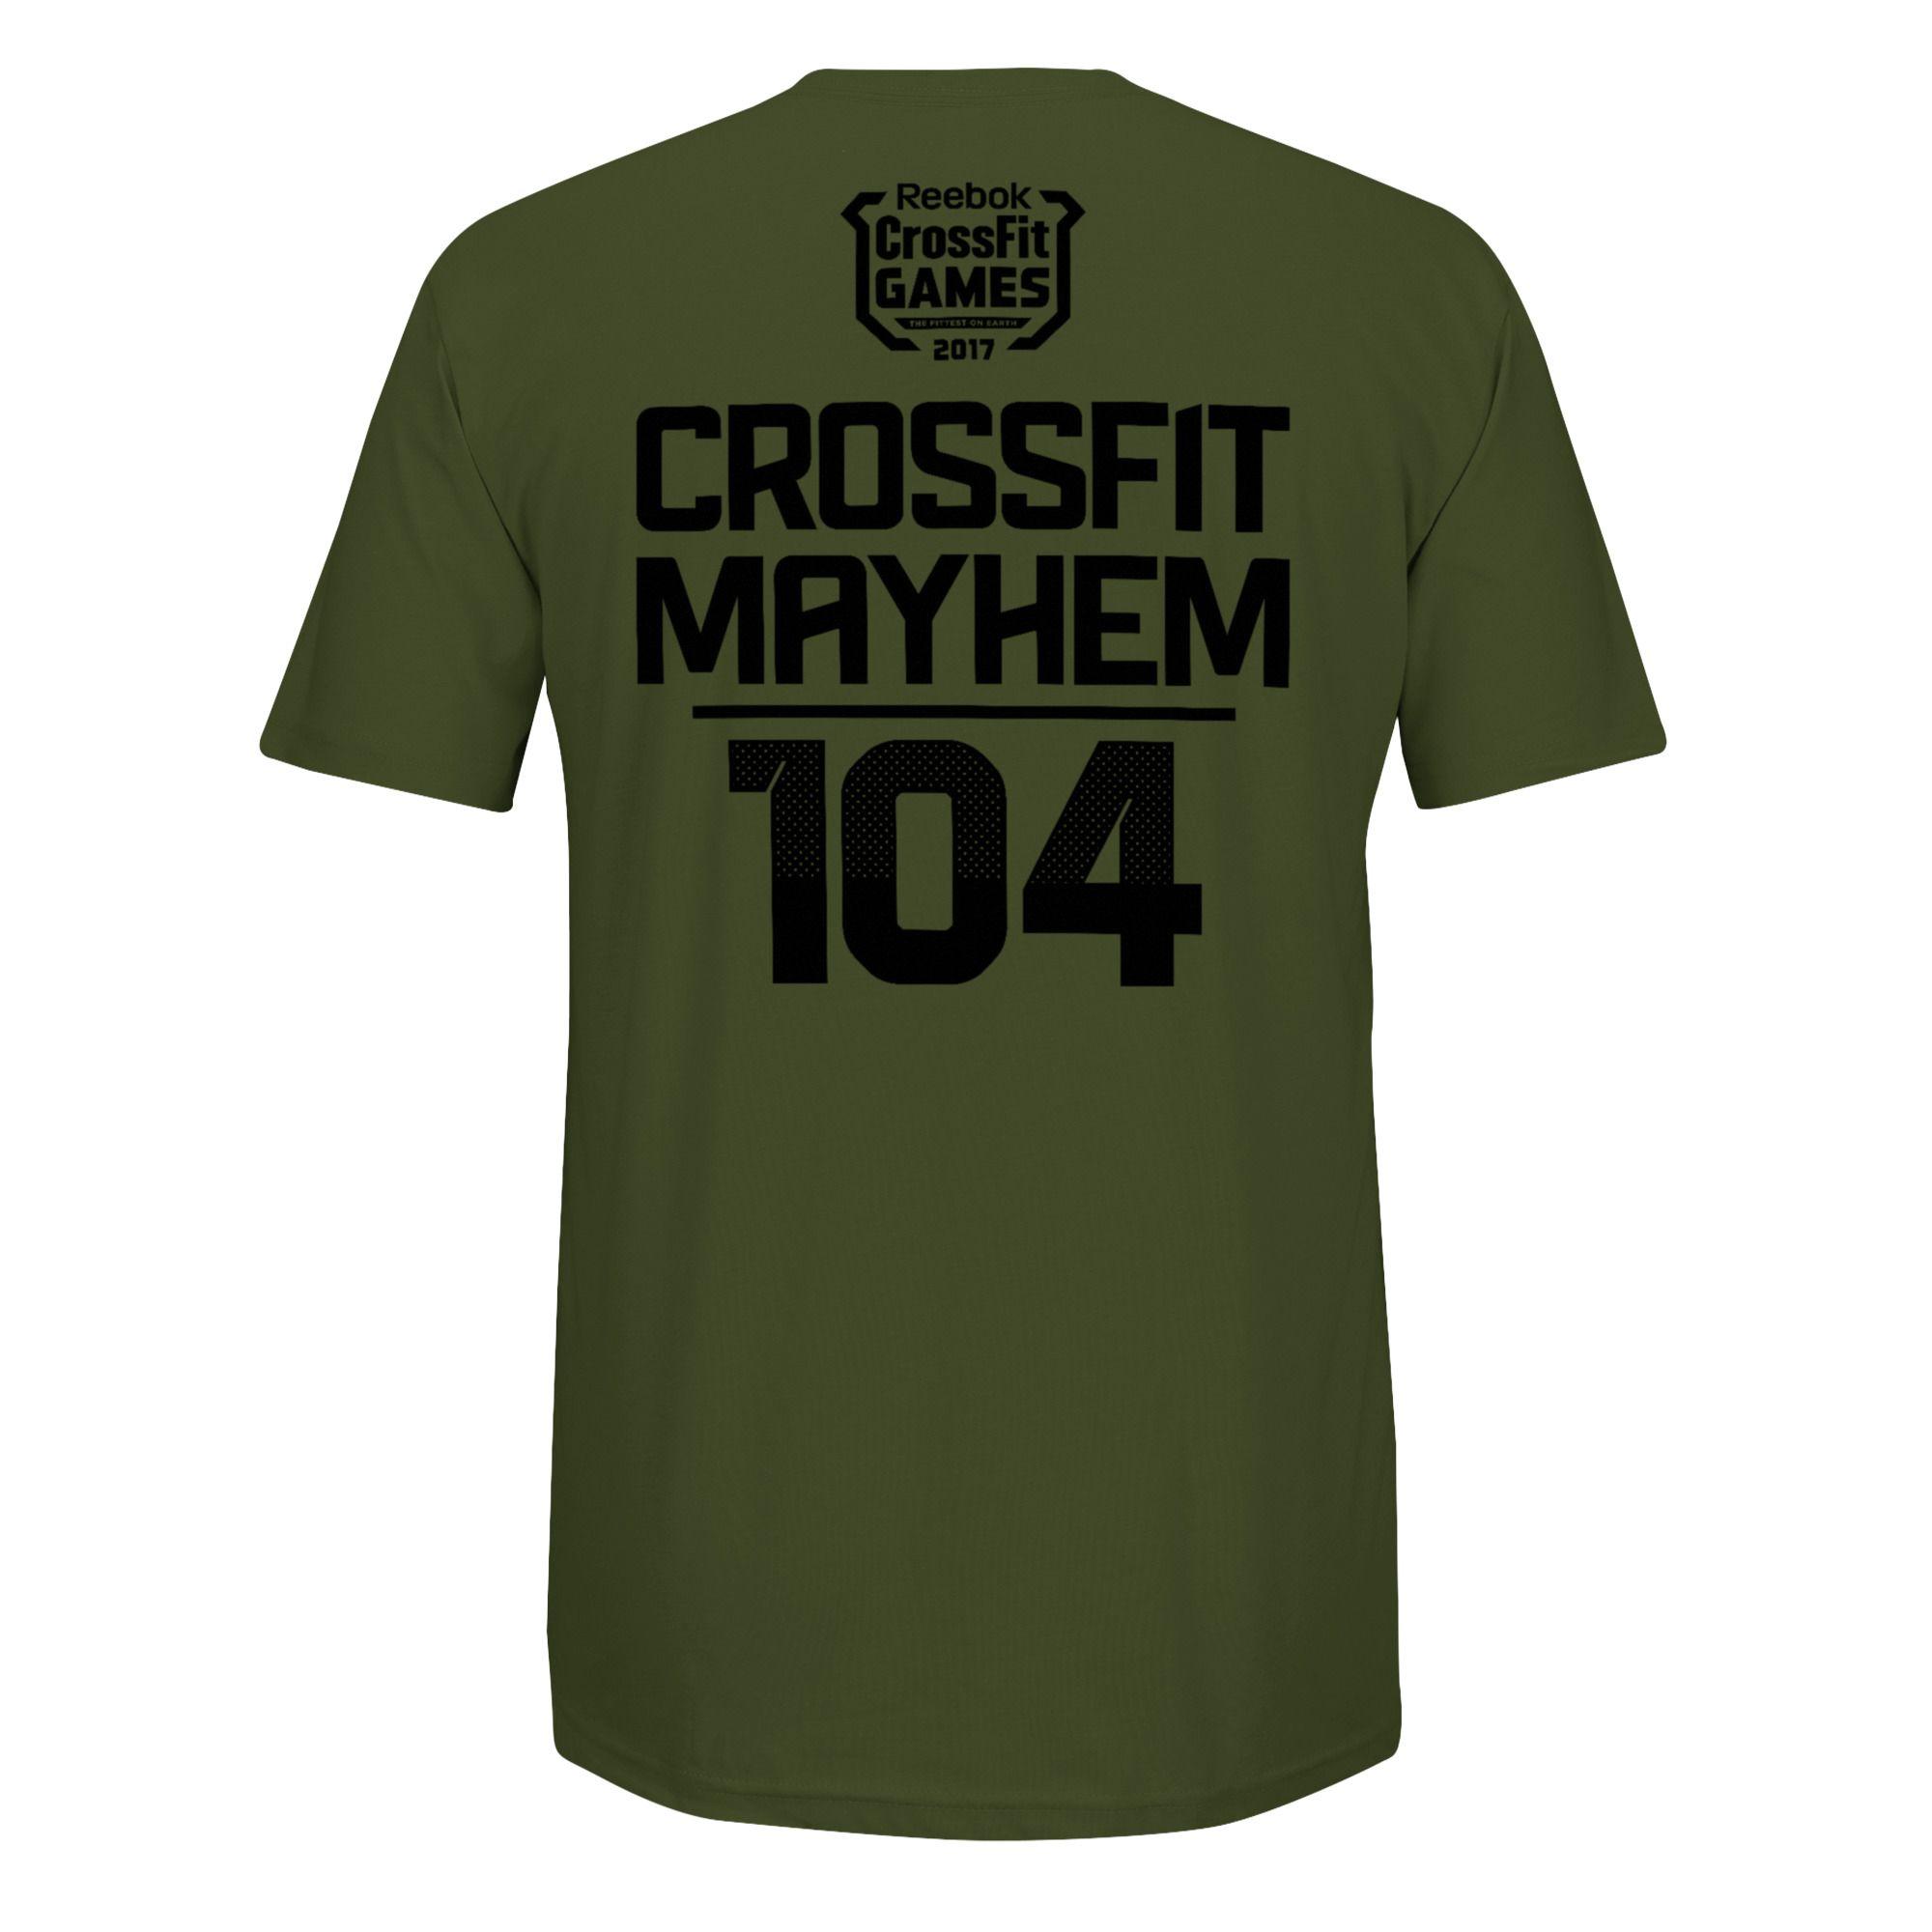 Camiseta Reebok Crossfit Games 17 - Team CrossFit Mayhem Freedom   - Rei do Wod